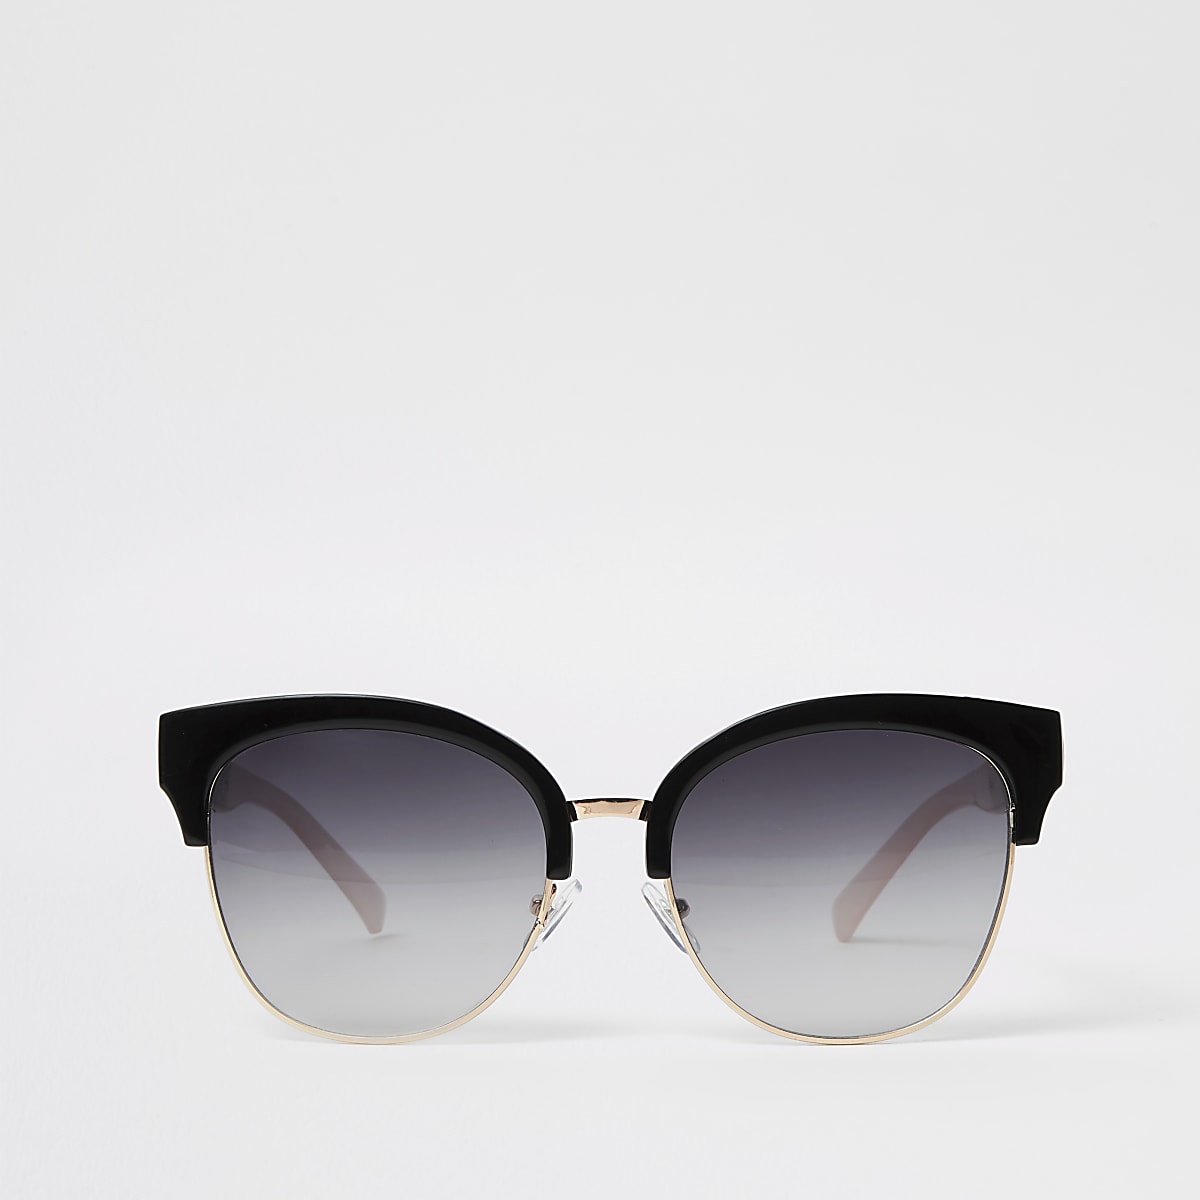 Goudkleurige oversized pilotenzonnebril met zwarte glazen